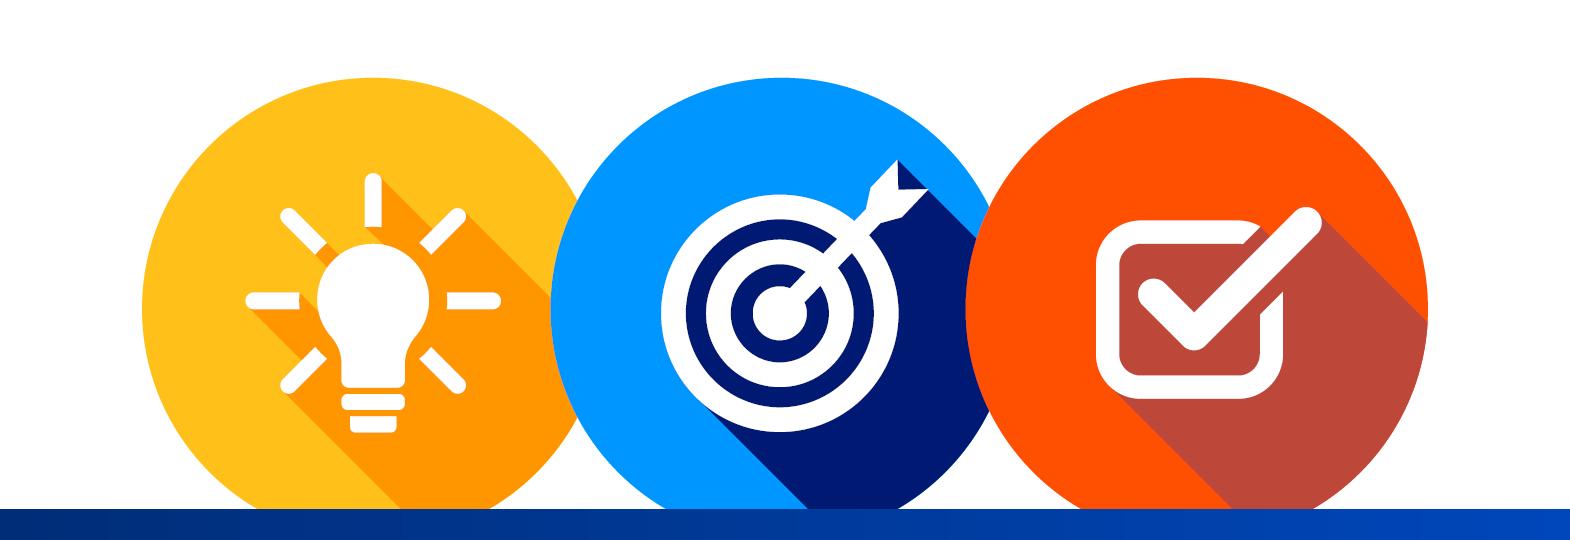 DRI Solutions Marketplace Light bulb, target, check box